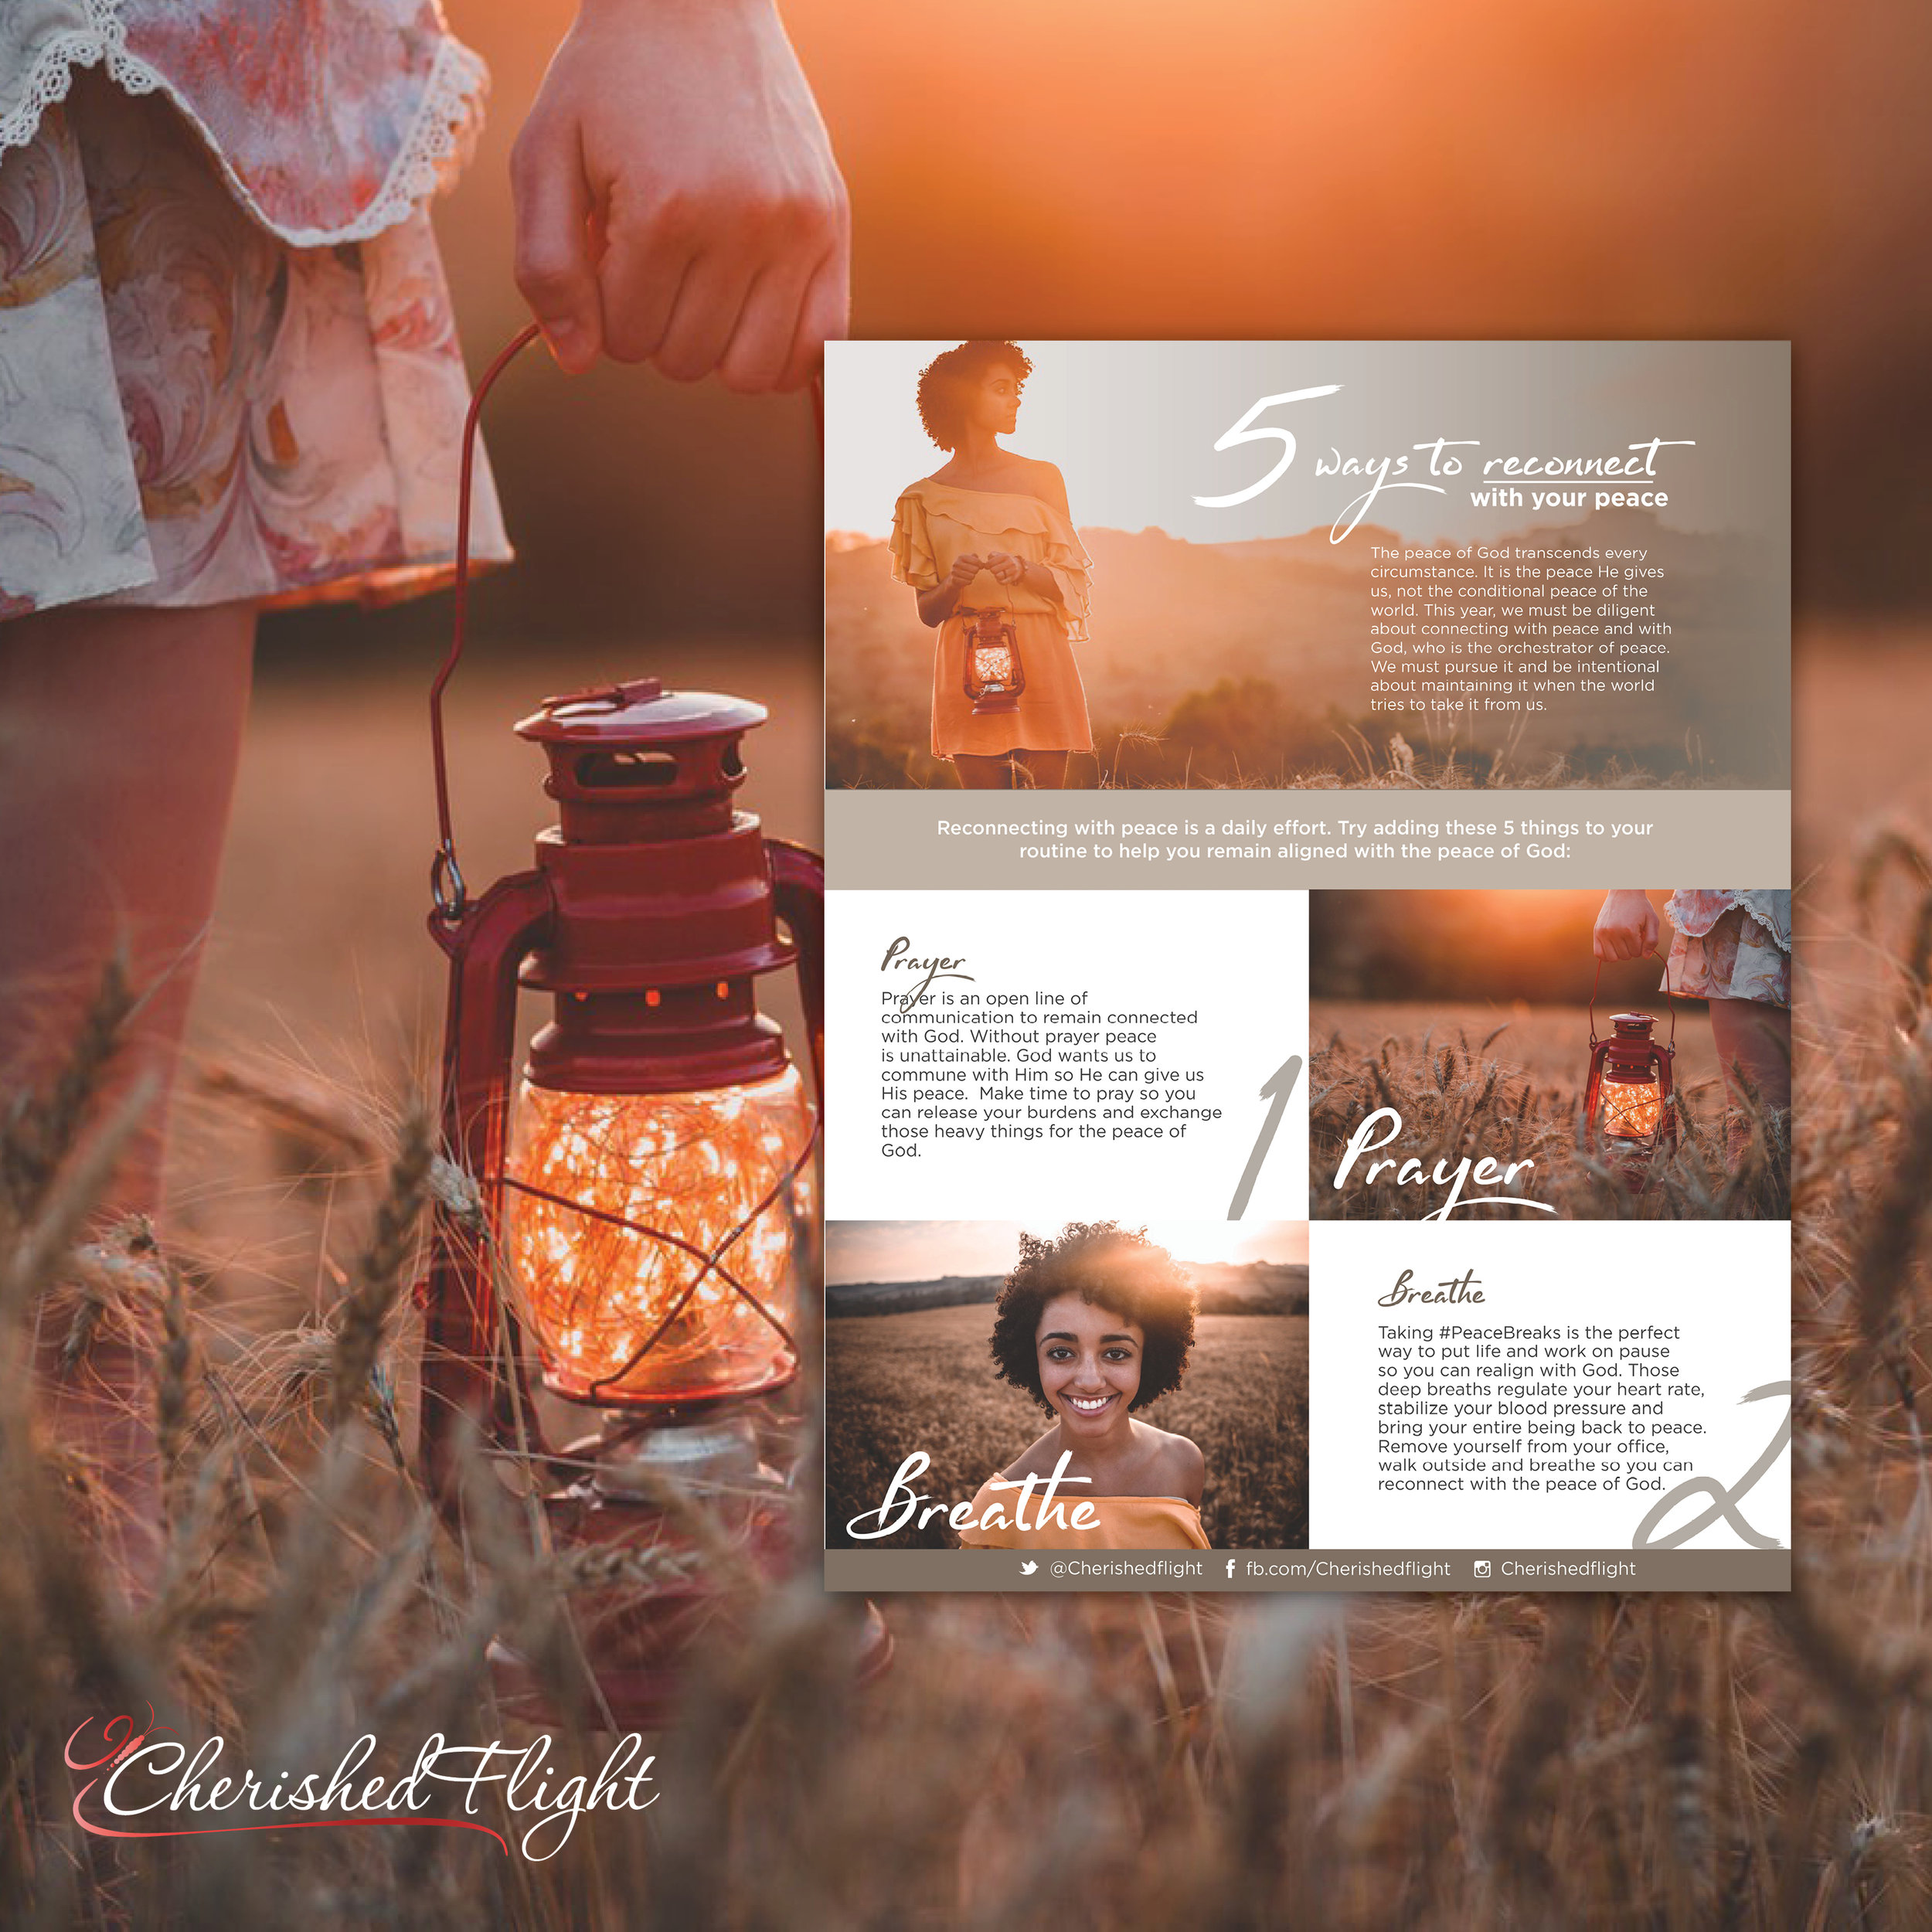 CherishedFlight_SM.jpg